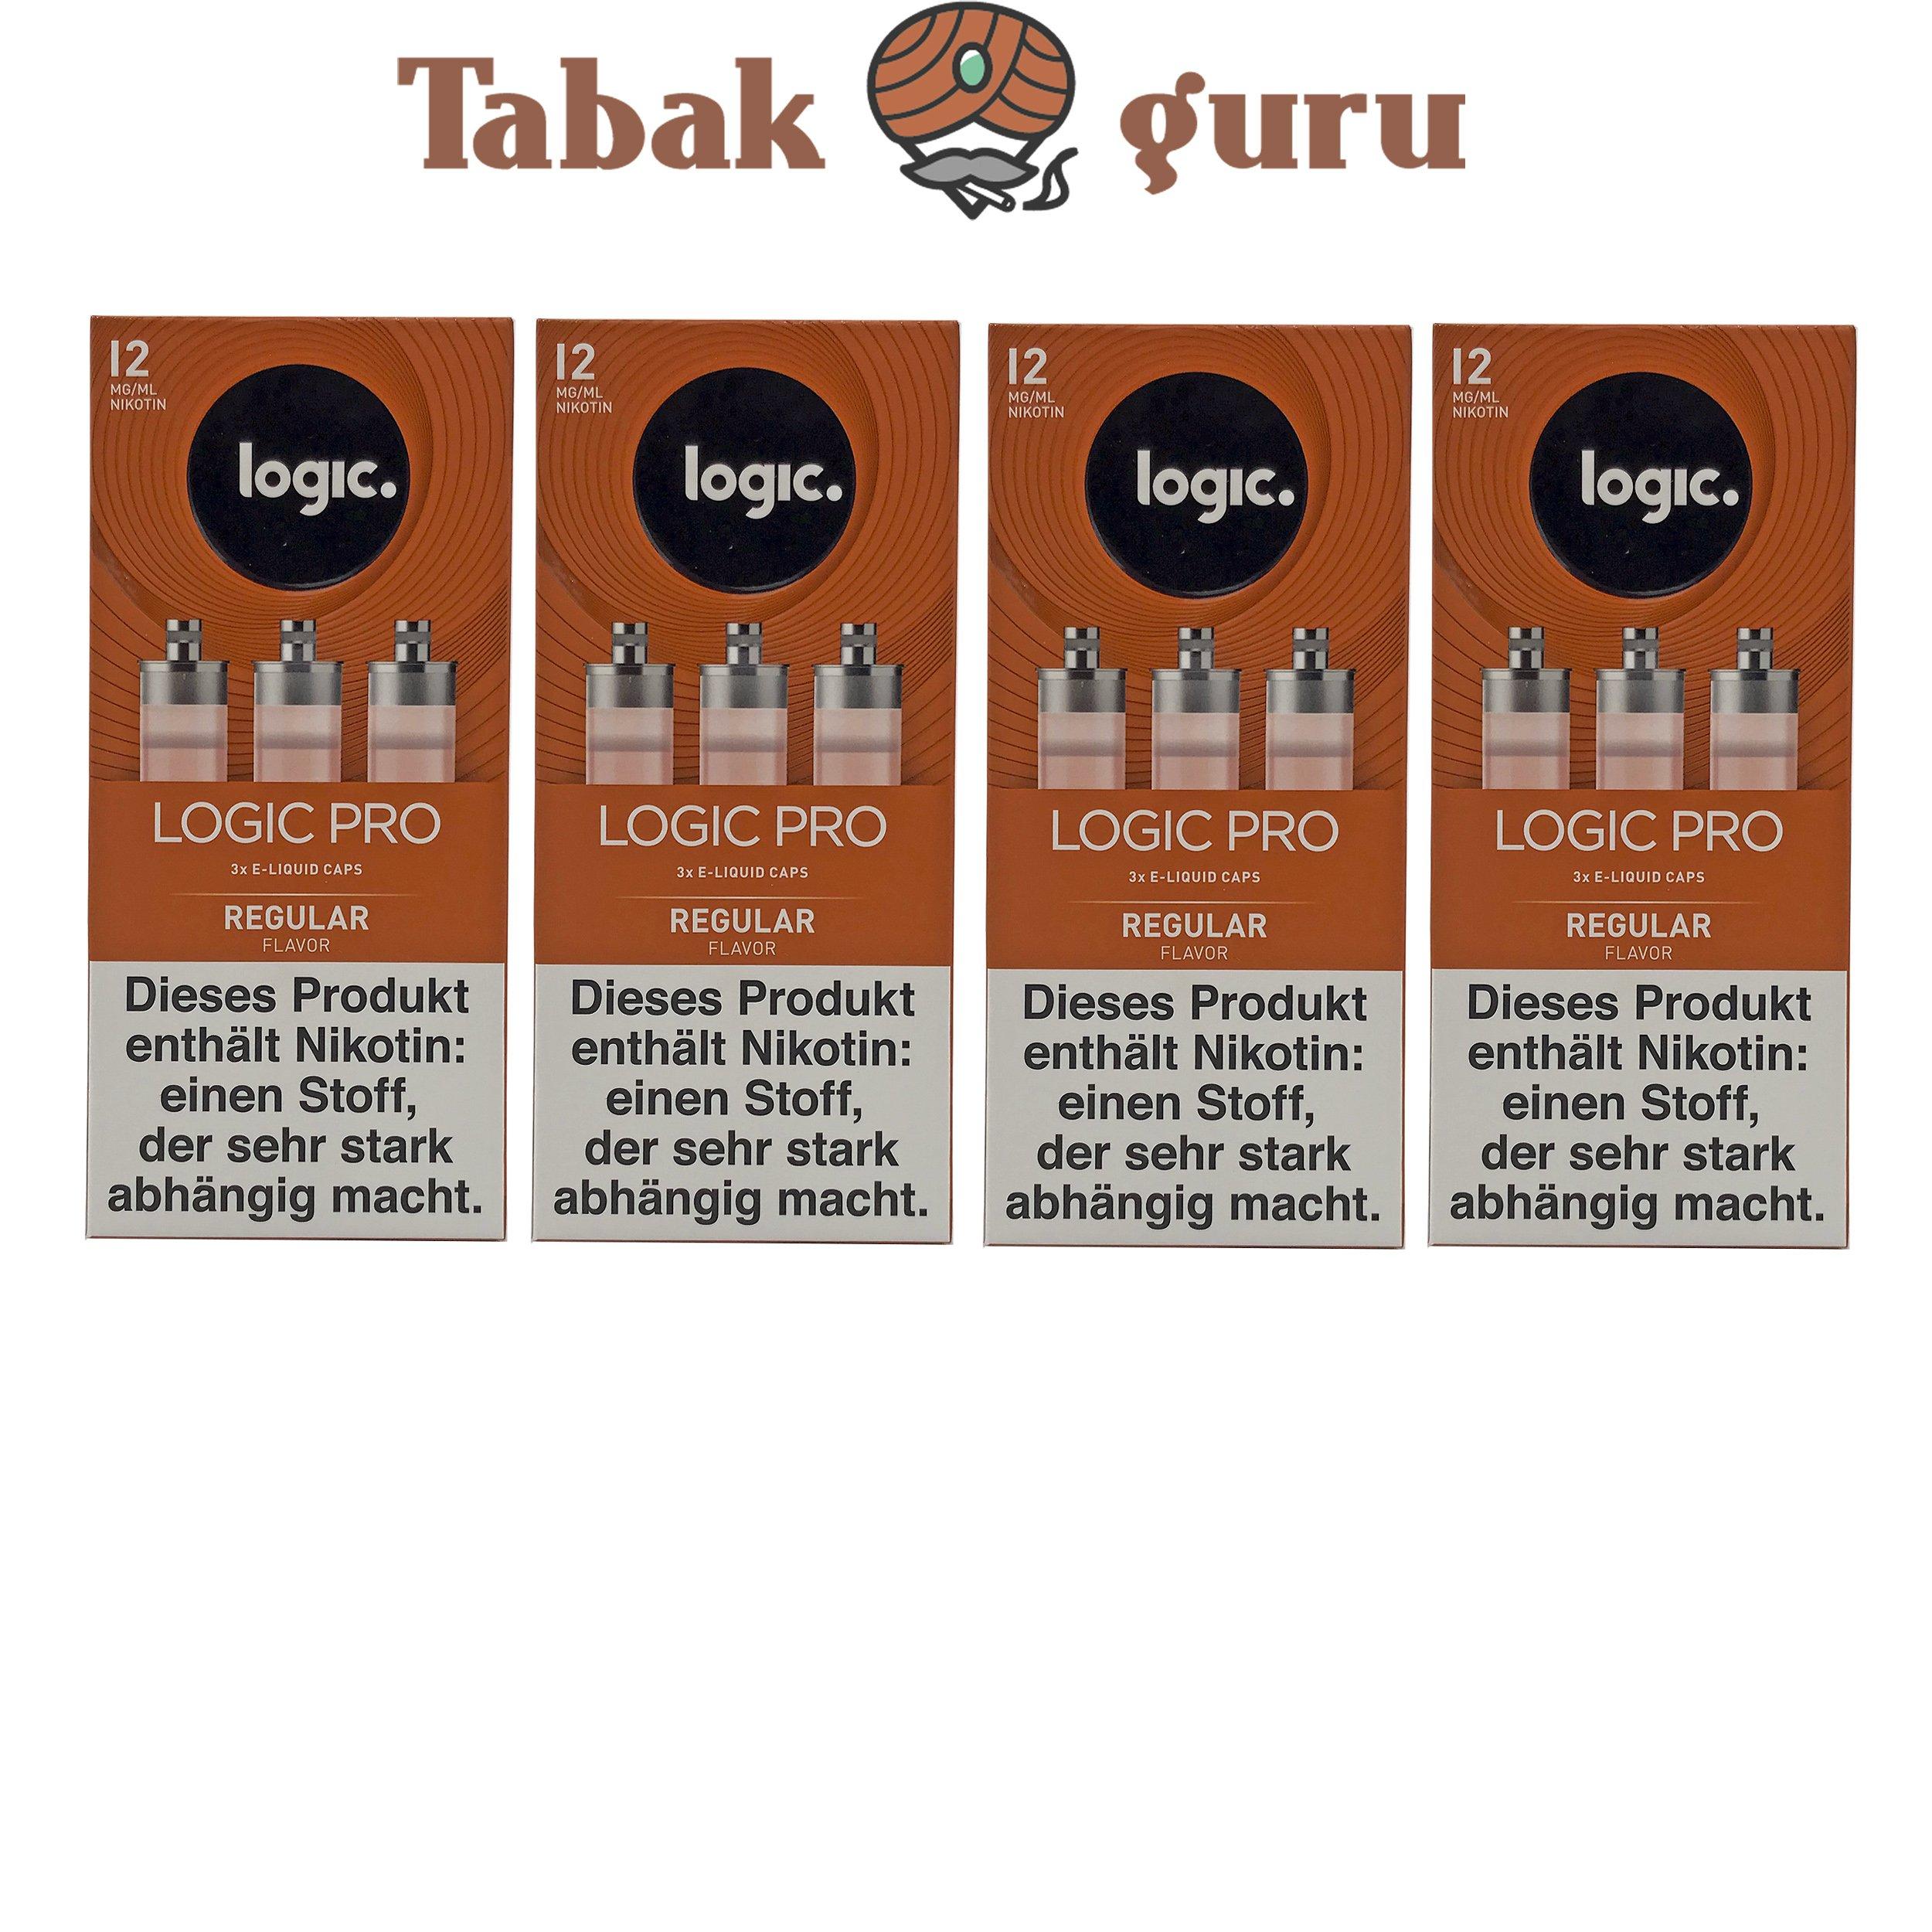 Logic Pro e-Liquid 4 Pack Caps Regular Flavor 12 mg/ml